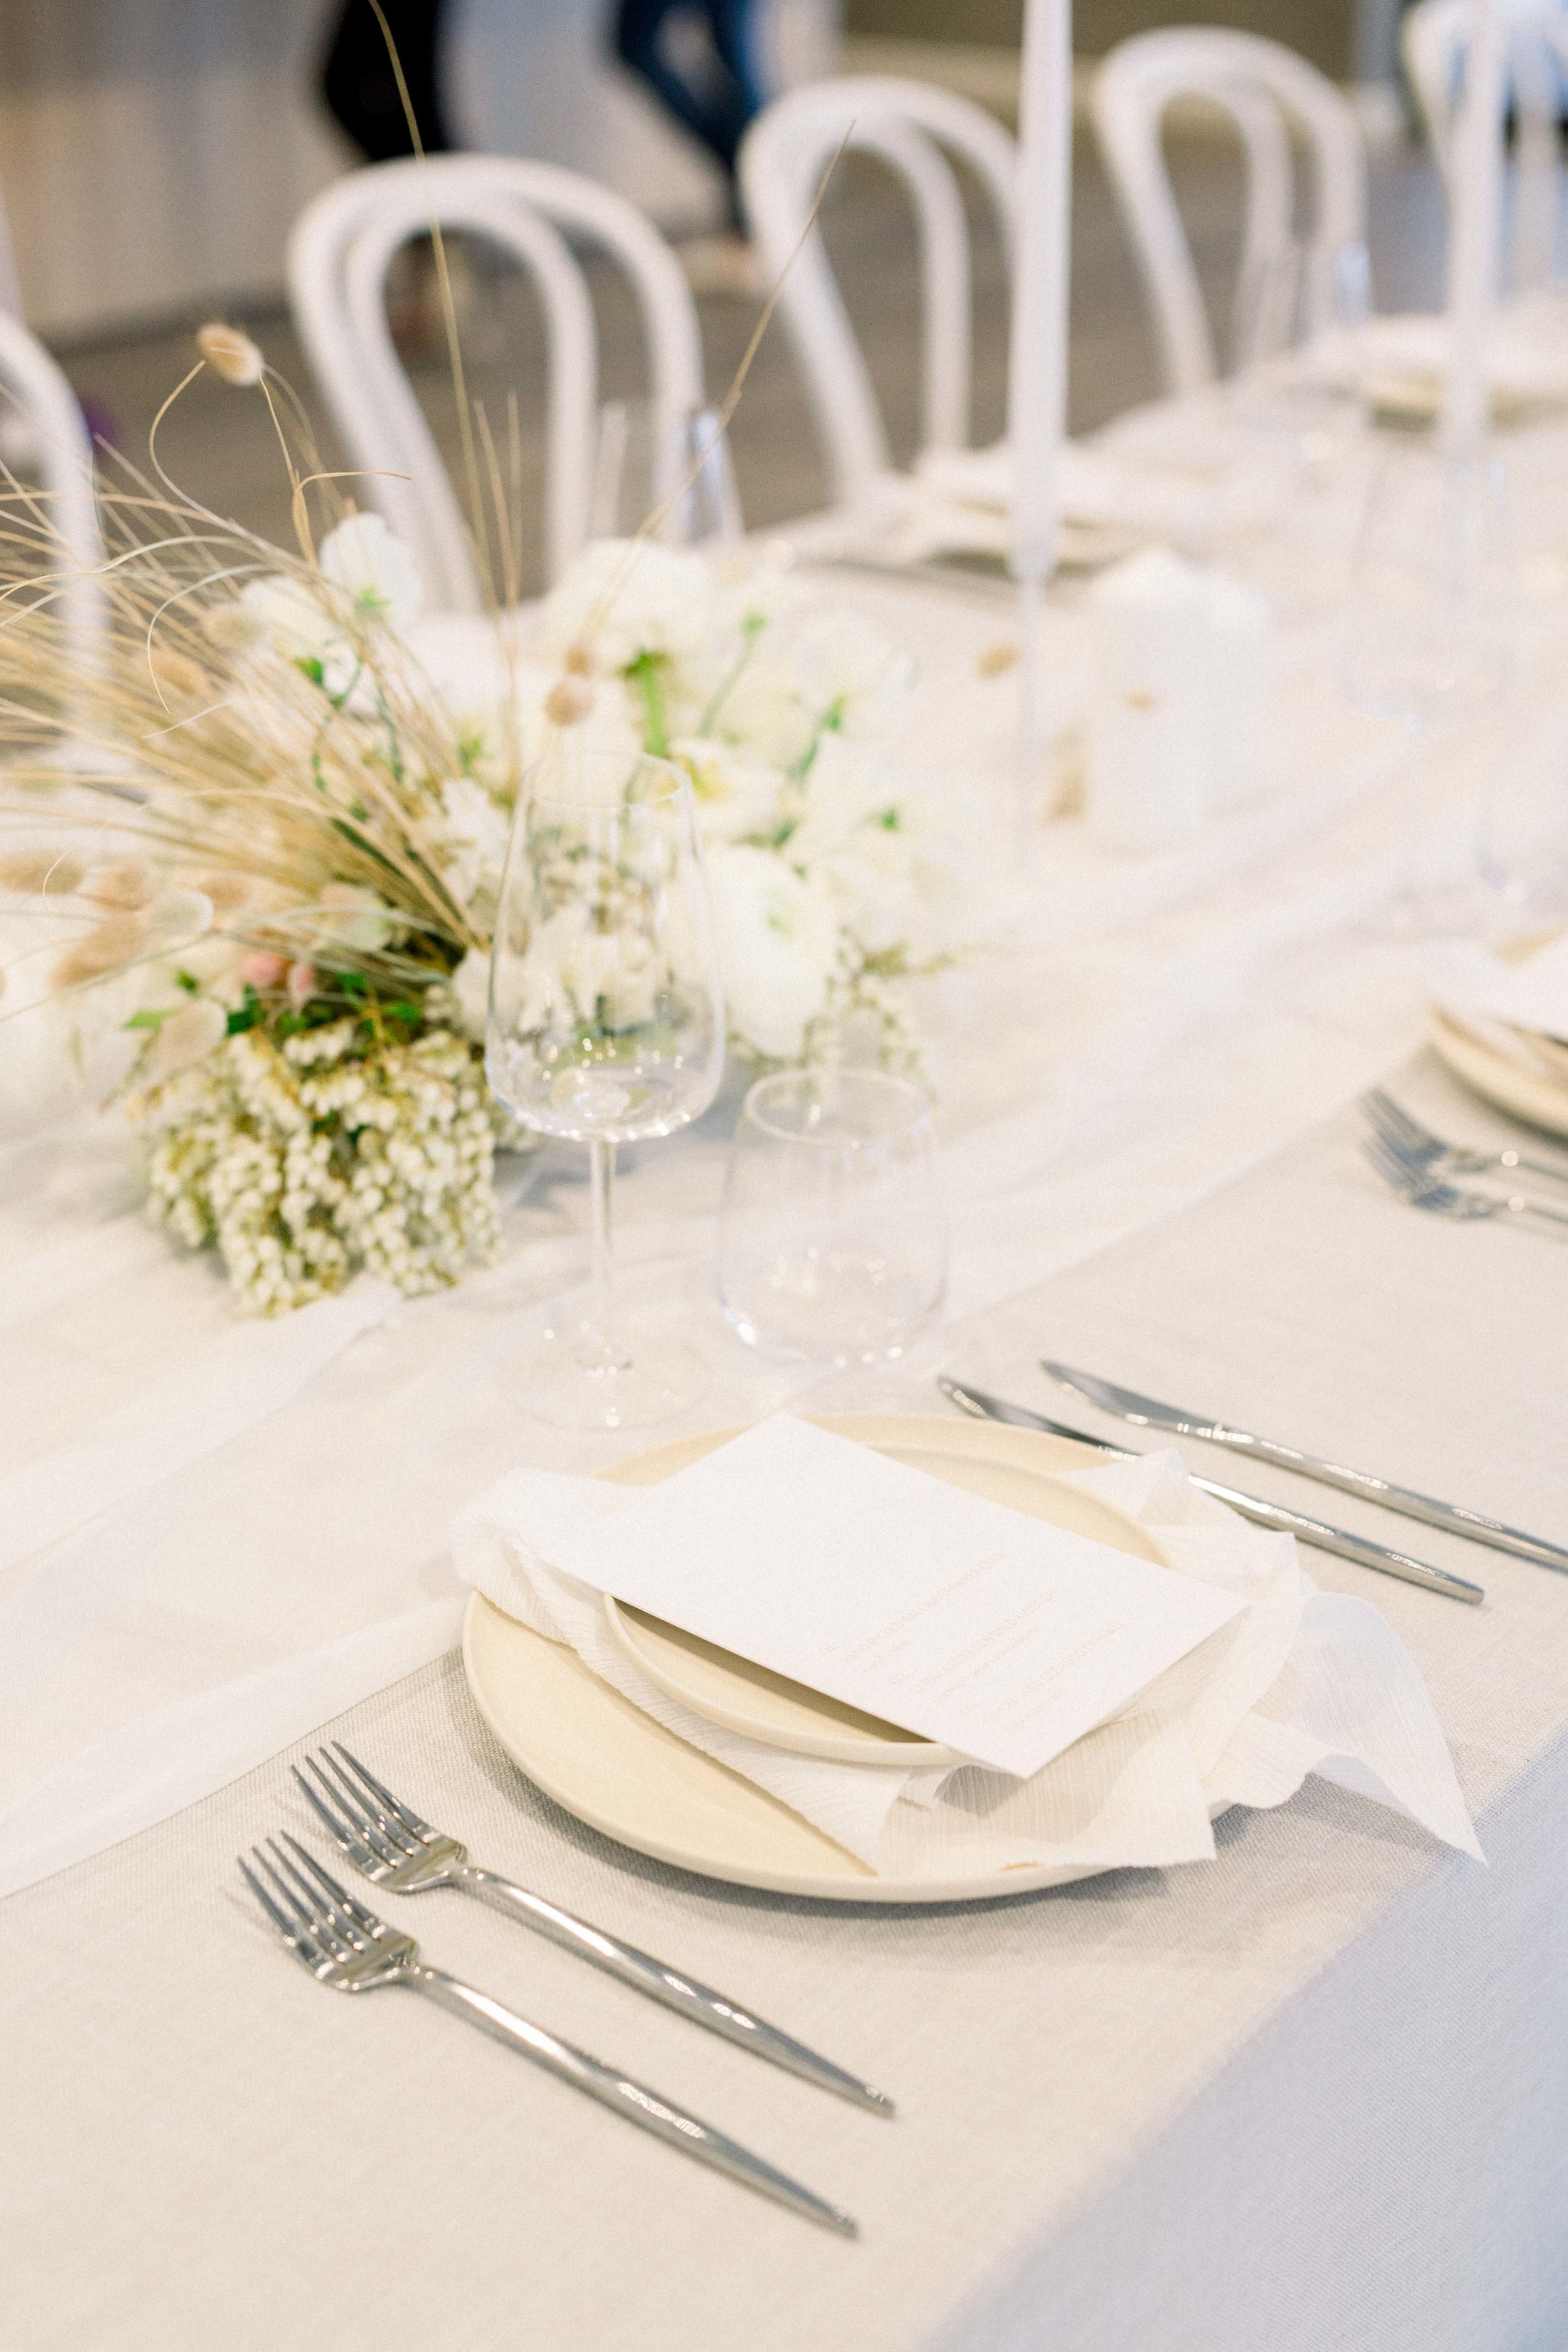 Fremantle Wedding Walk - Blue HQ, Perth Wedding Venue -  Tessa Kit Photography -JQ9A8471.jpg